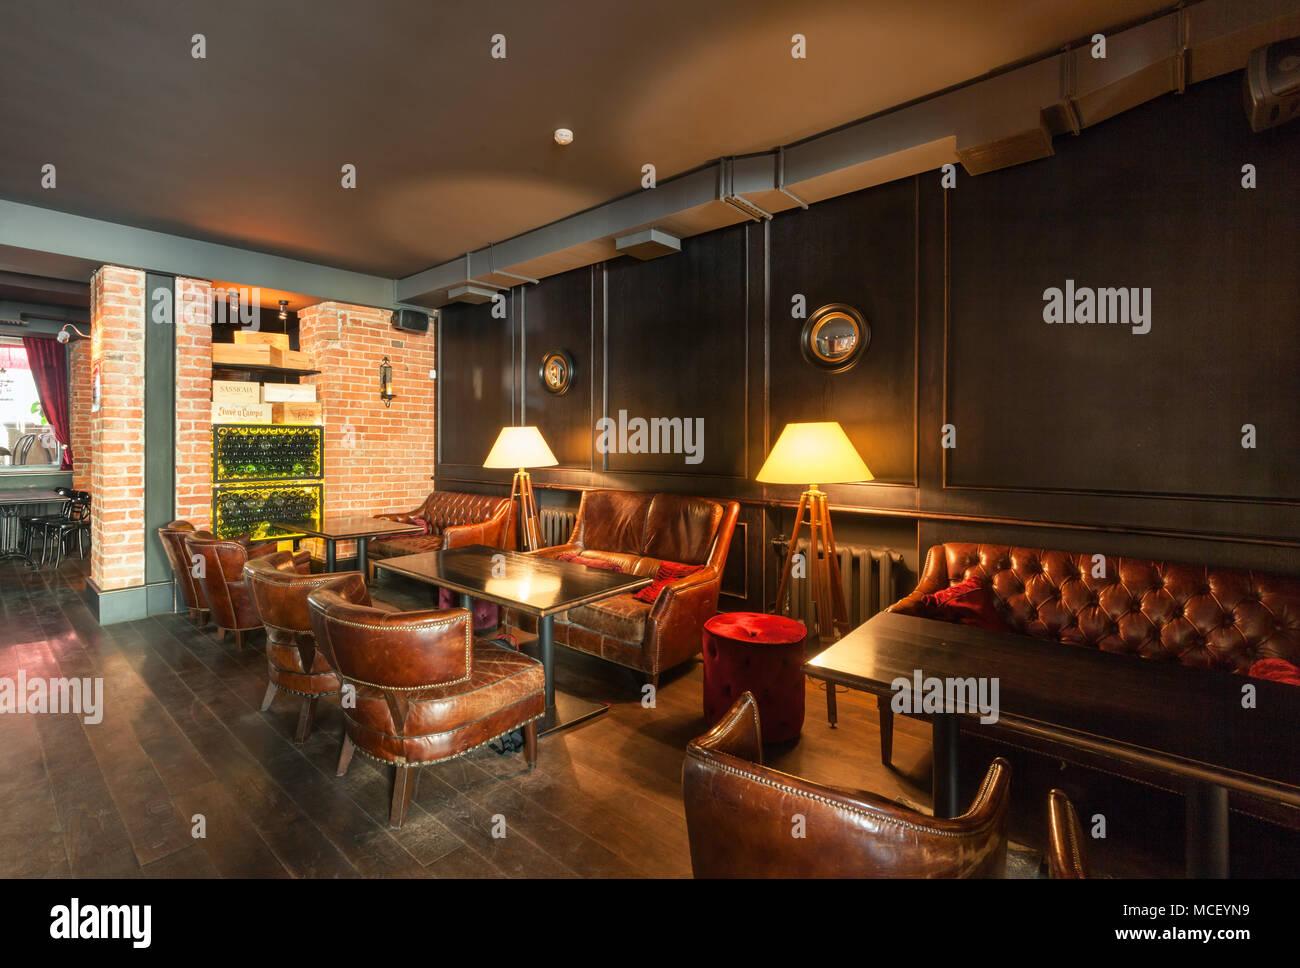 Interieur D Un Bar moscou - aoÛt 2014 : l'intérieur du bar à vin 'gavroch